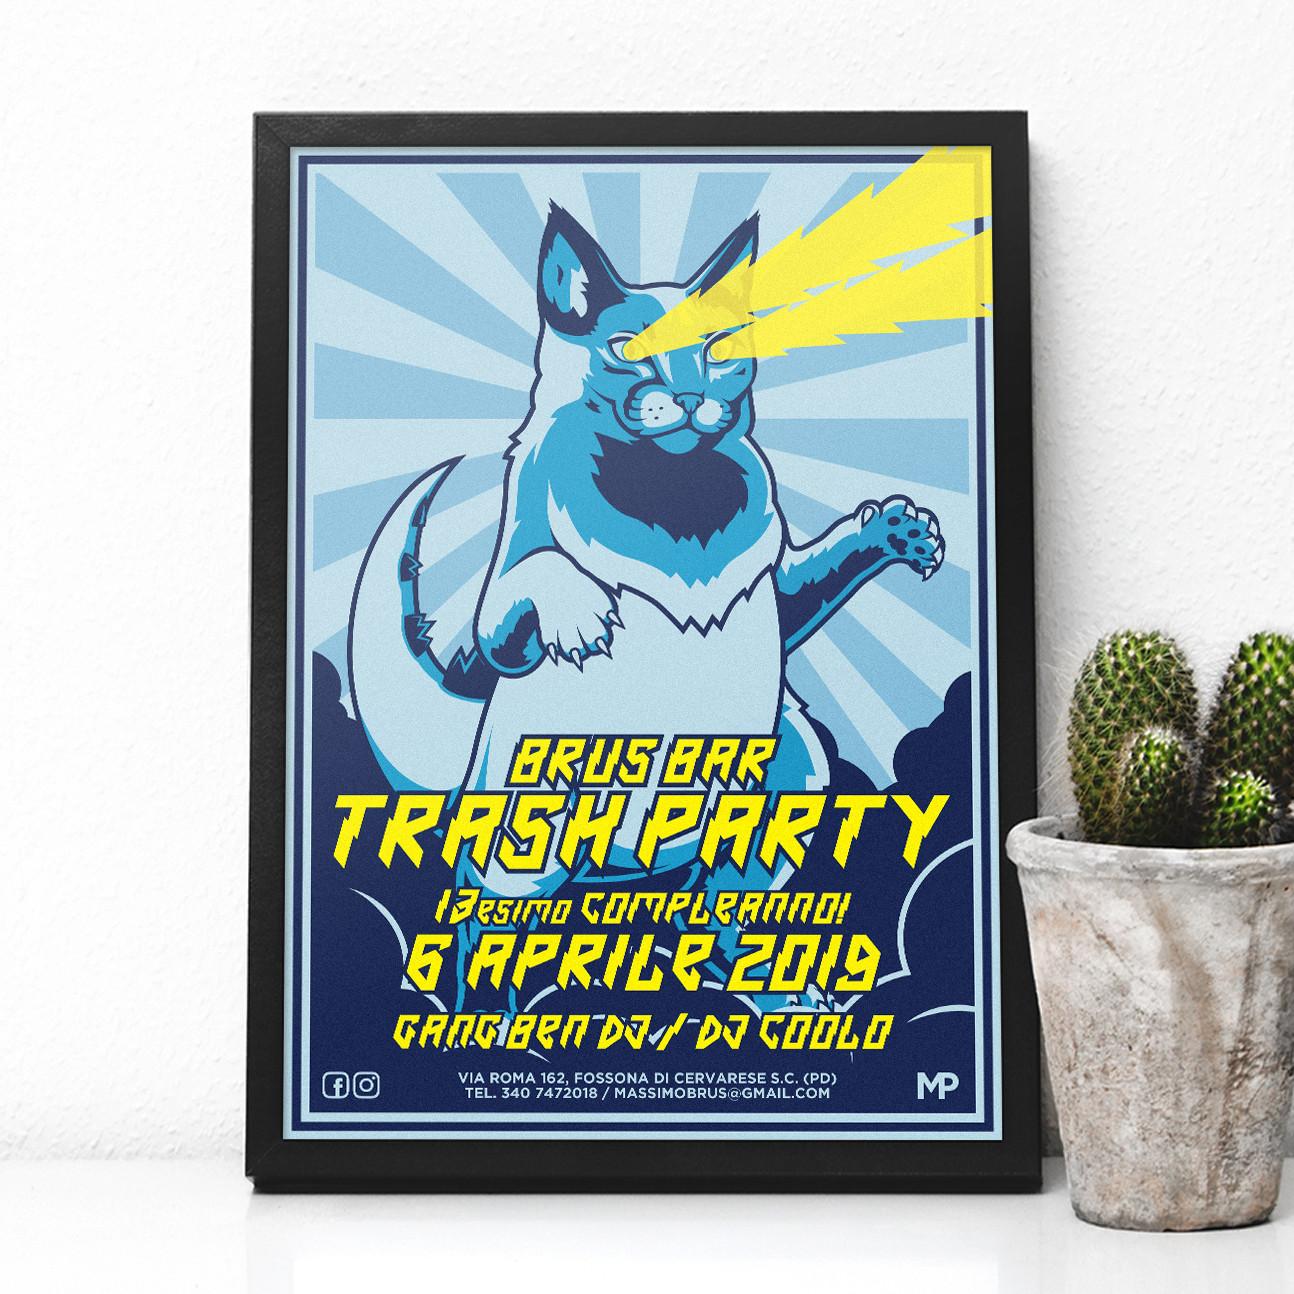 Brus Bar Trash Party 2019 Poster - MP Grafica